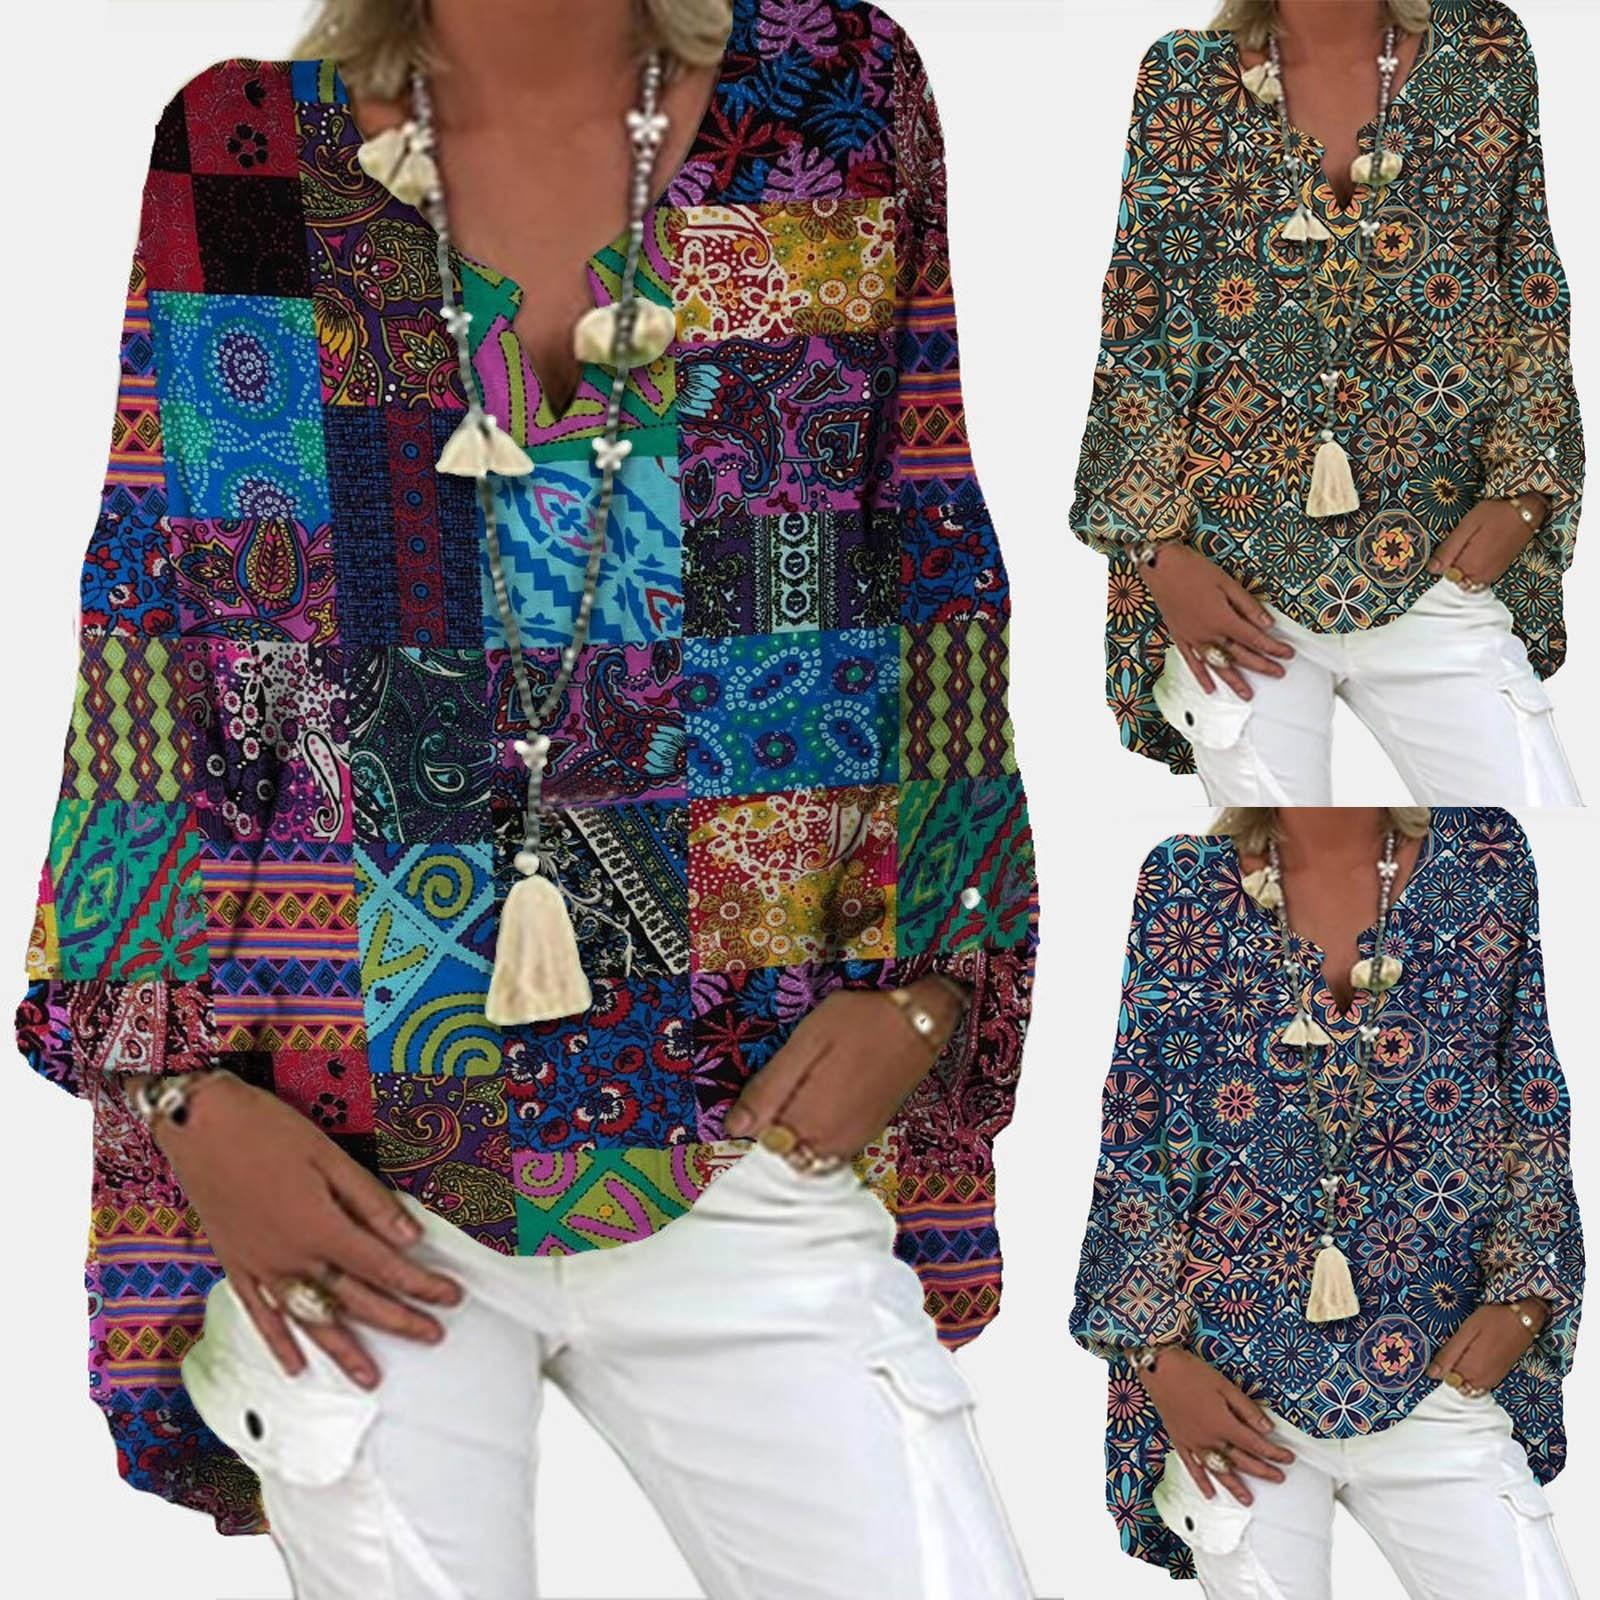 4# Jacquard Boho Print Blouse Shirts Women's Linen Cotton Loose Long Sleeve Blousesv-neck Top Women Clothing Blouses Shirts